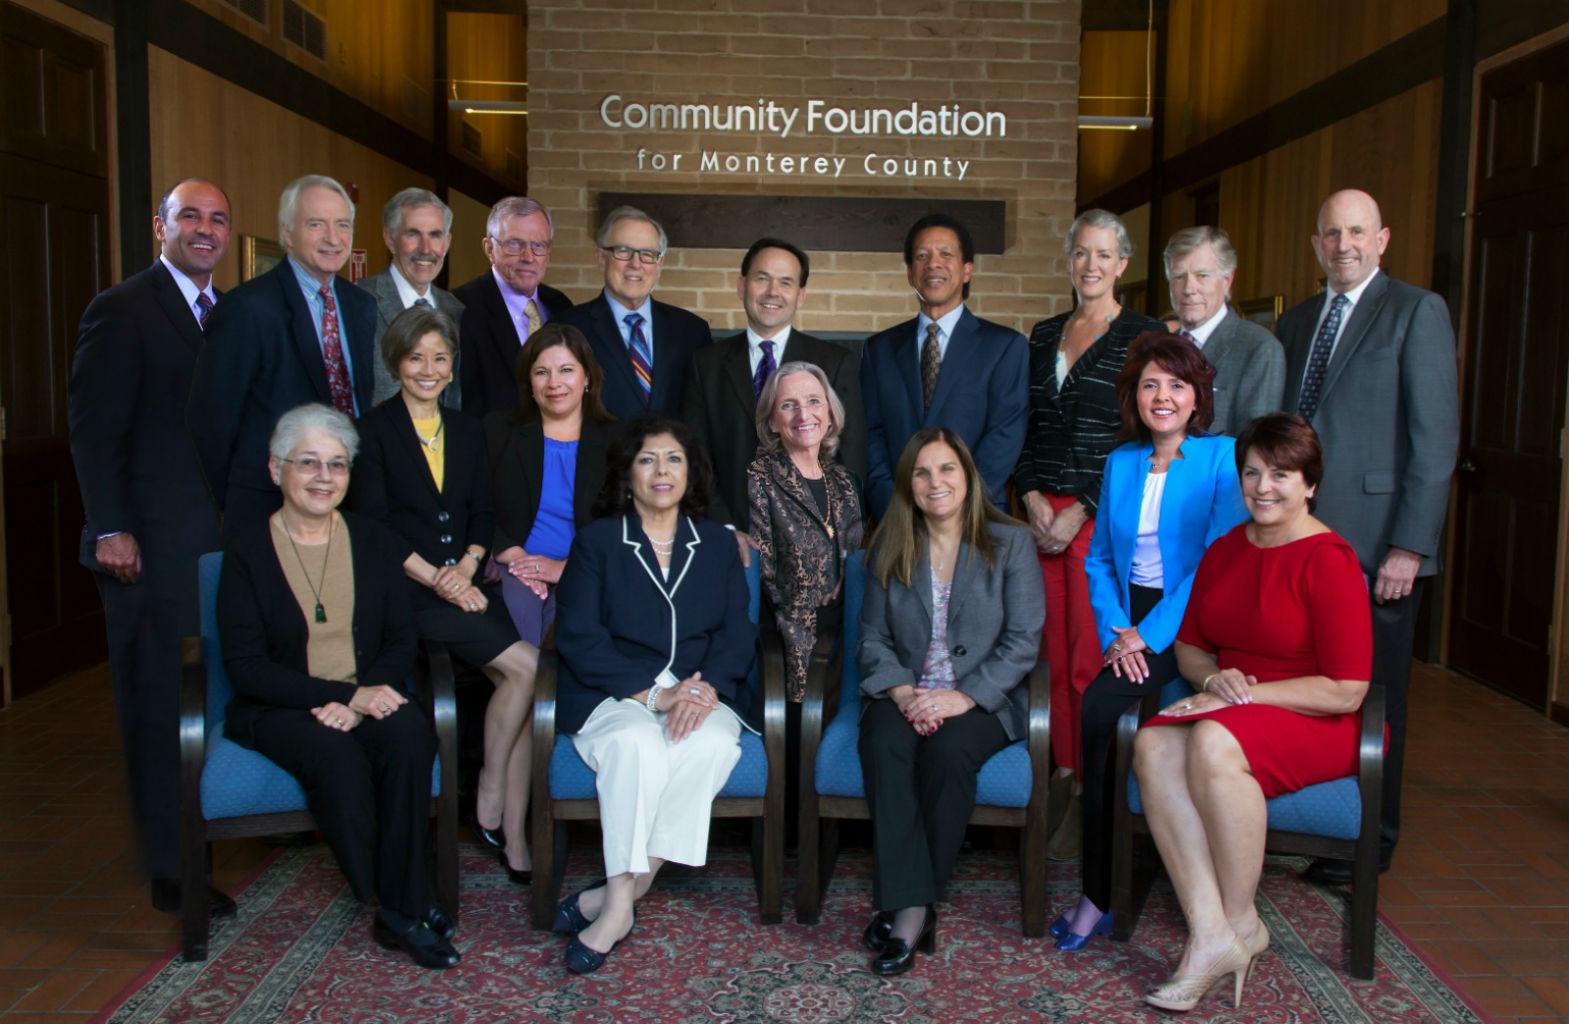 2016 Board Members Announced